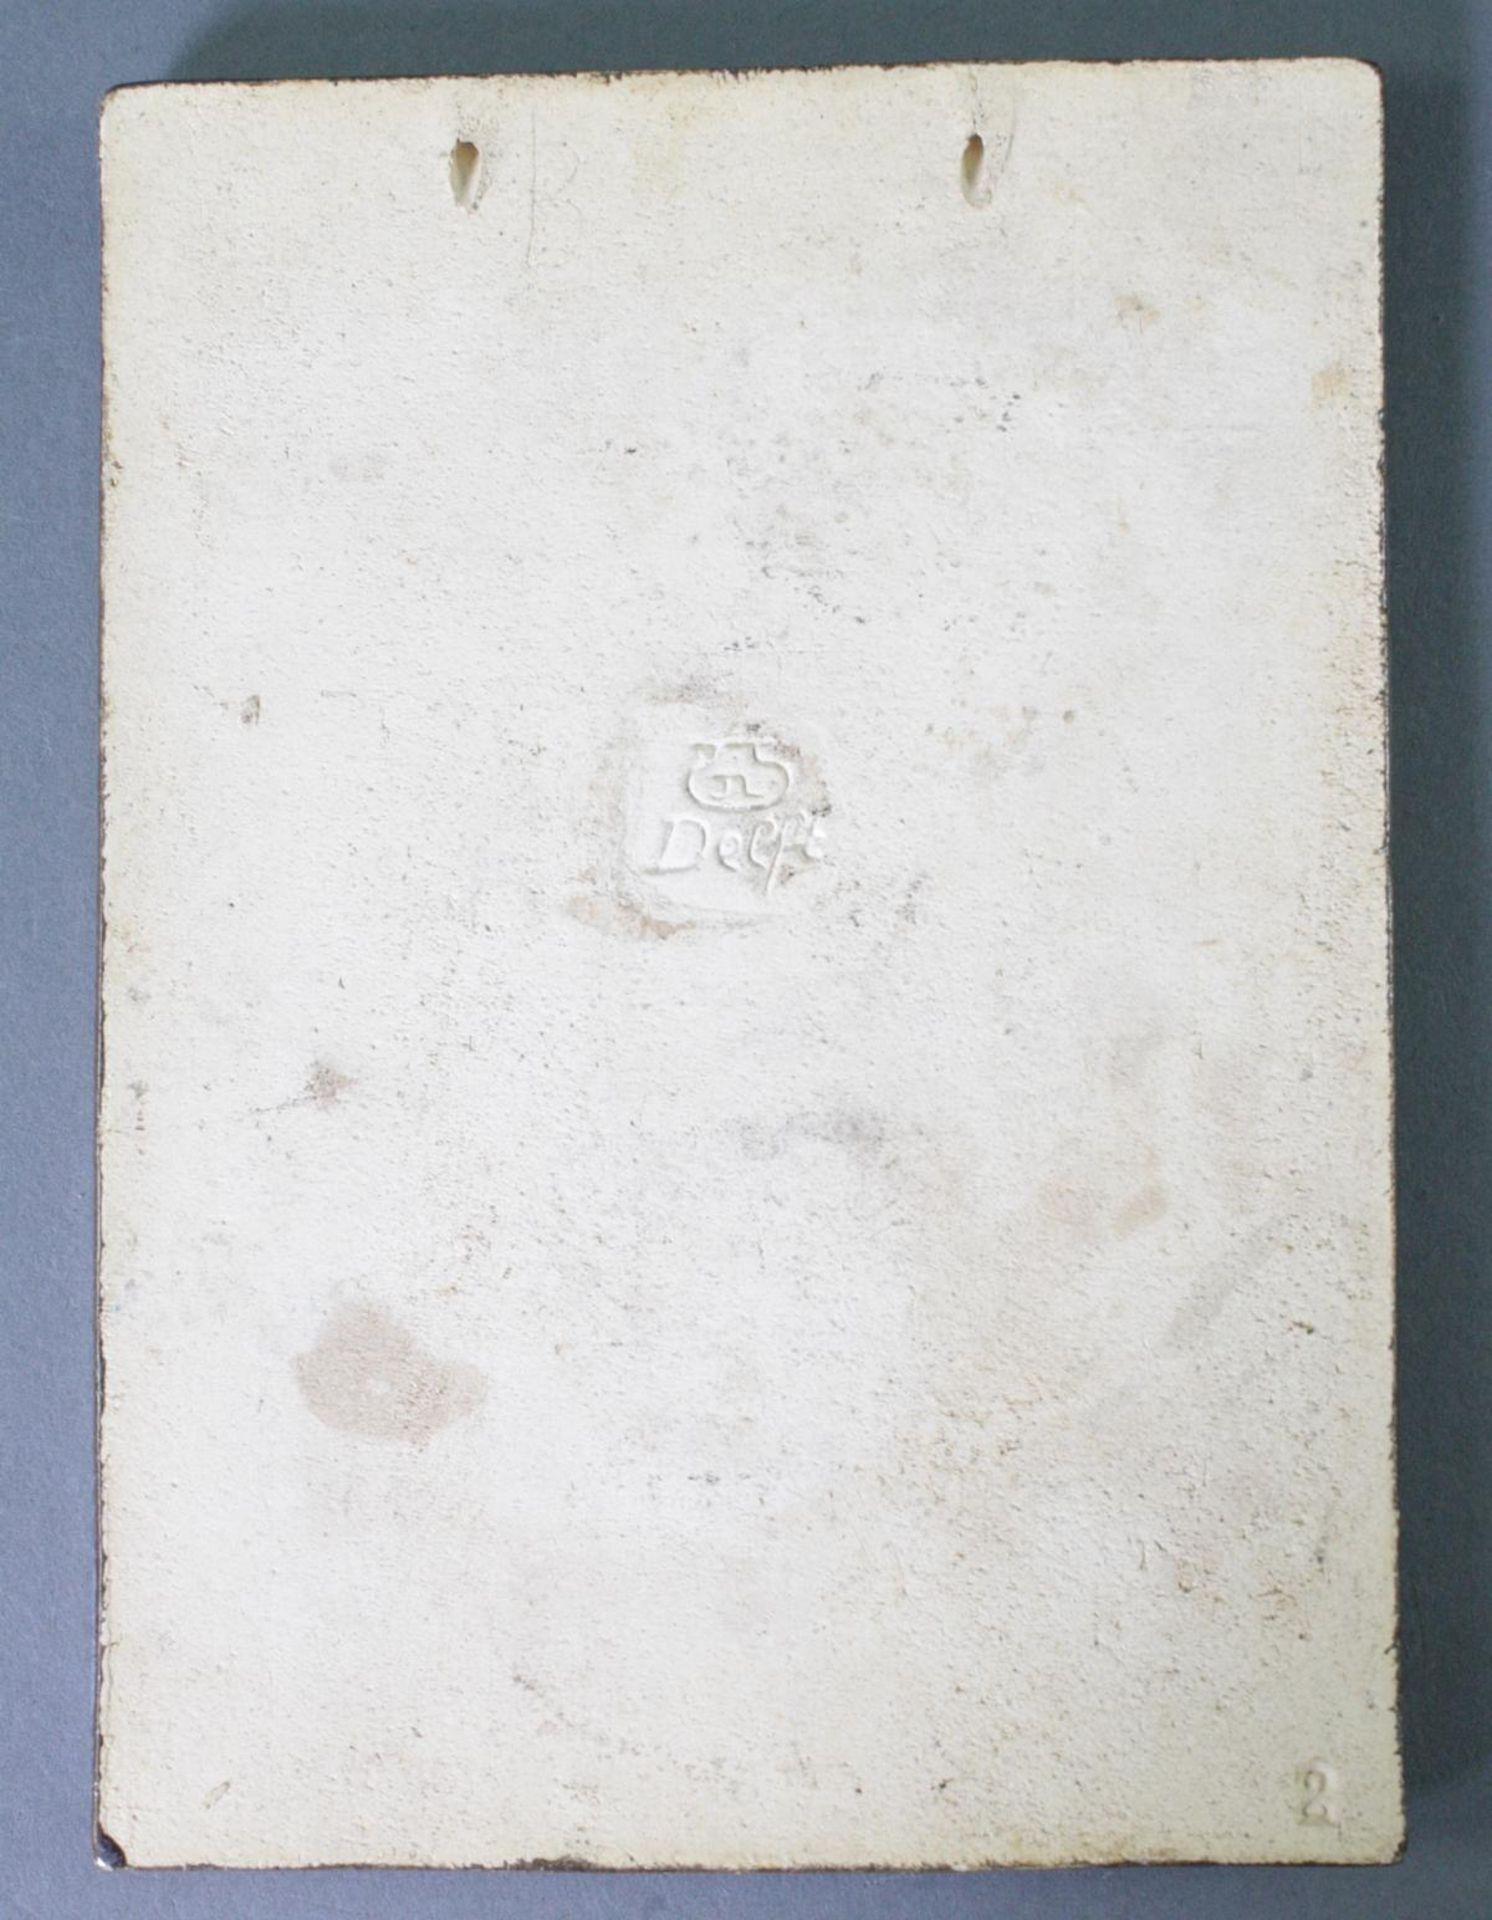 Wandkachel, H.J. Tieman, Delft - Bild 2 aus 3